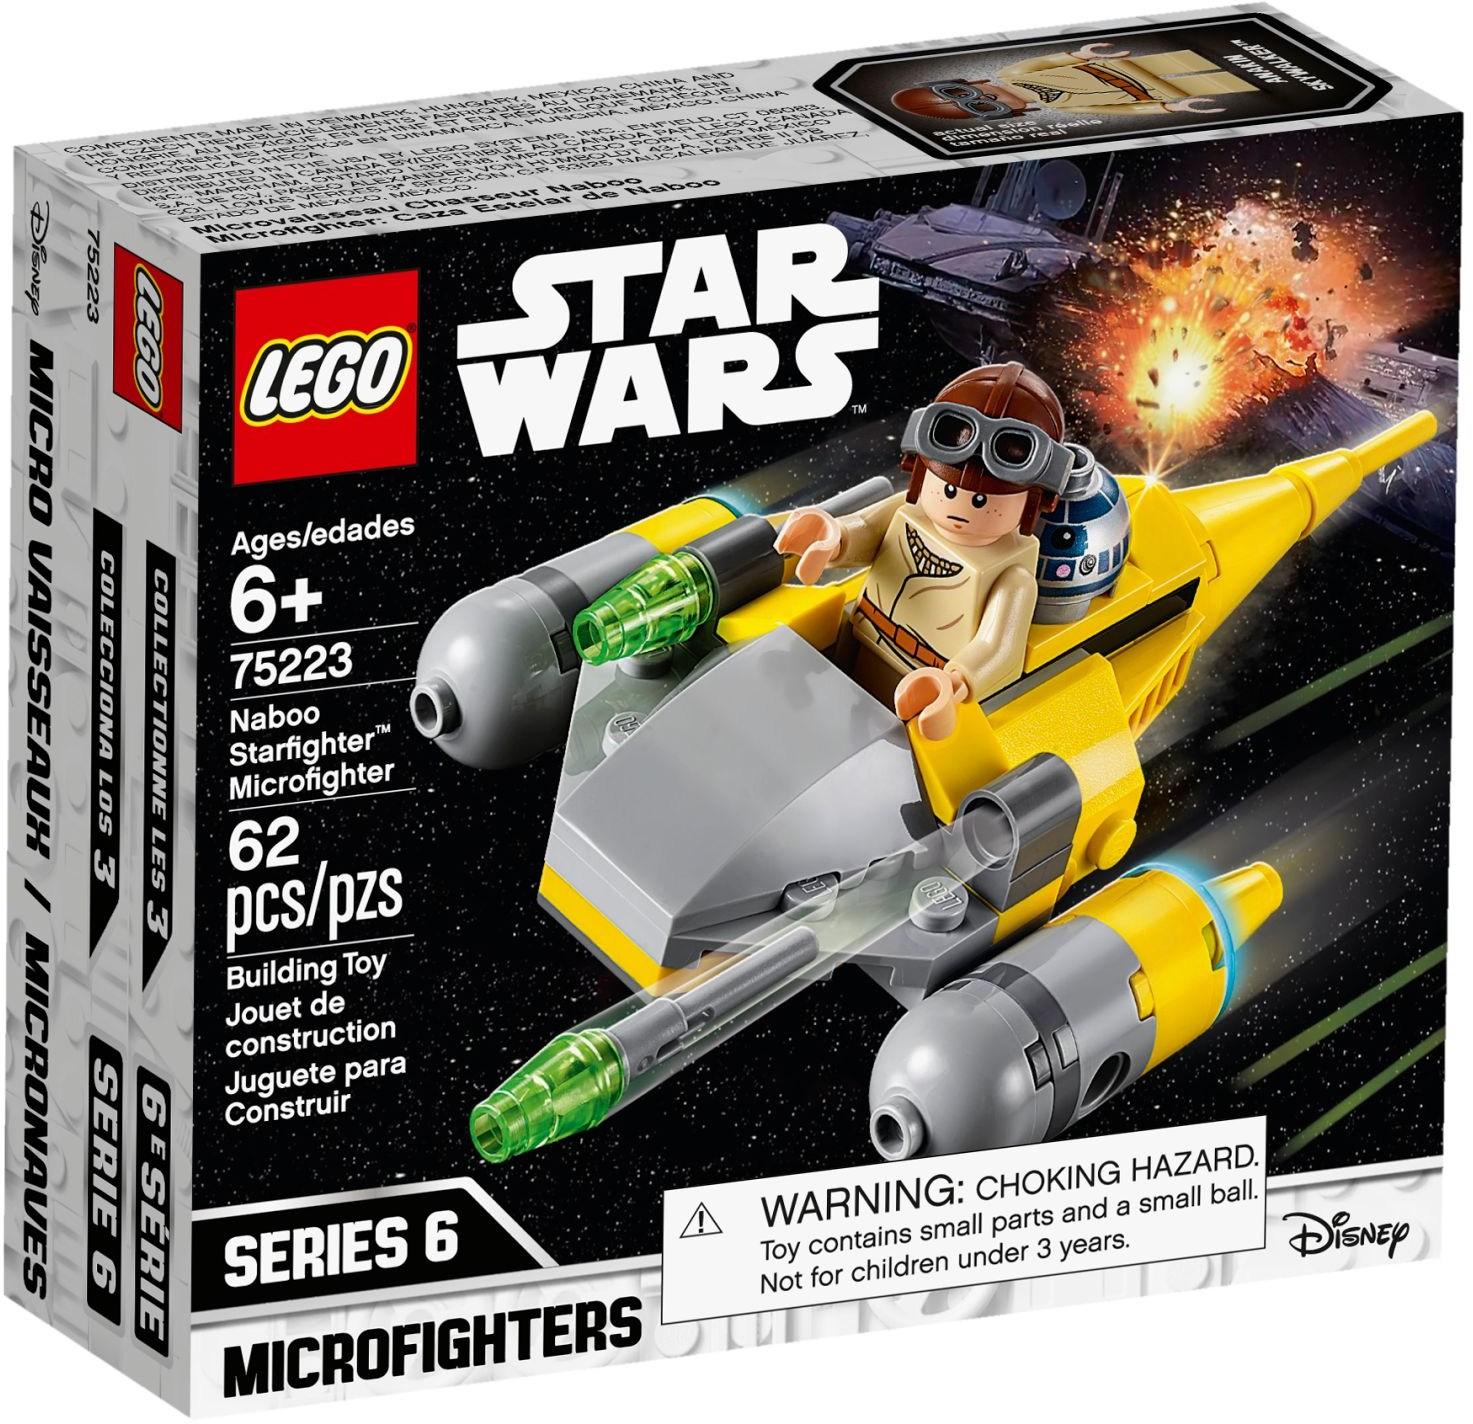 75223 Naboo Starfighter Microfighter